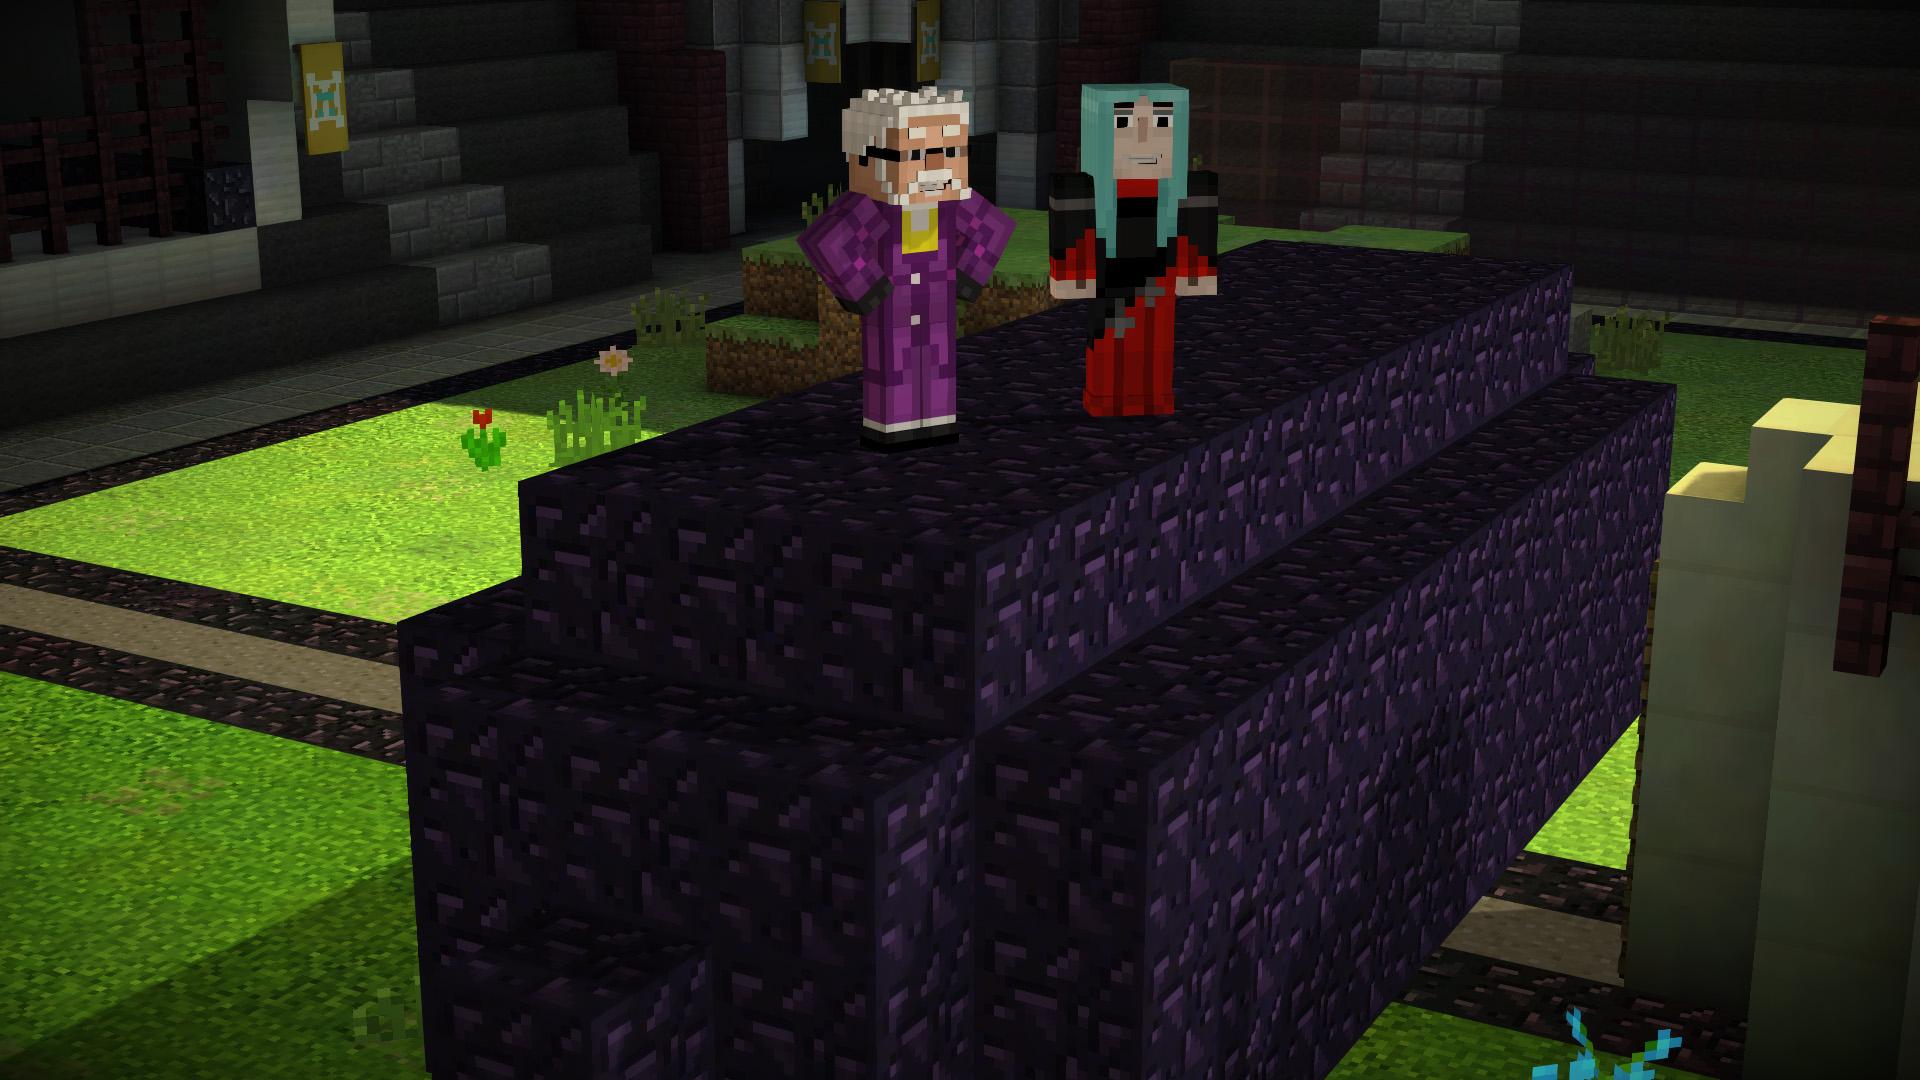 minecraft-story-mode-episodio-8-gamesoul-2